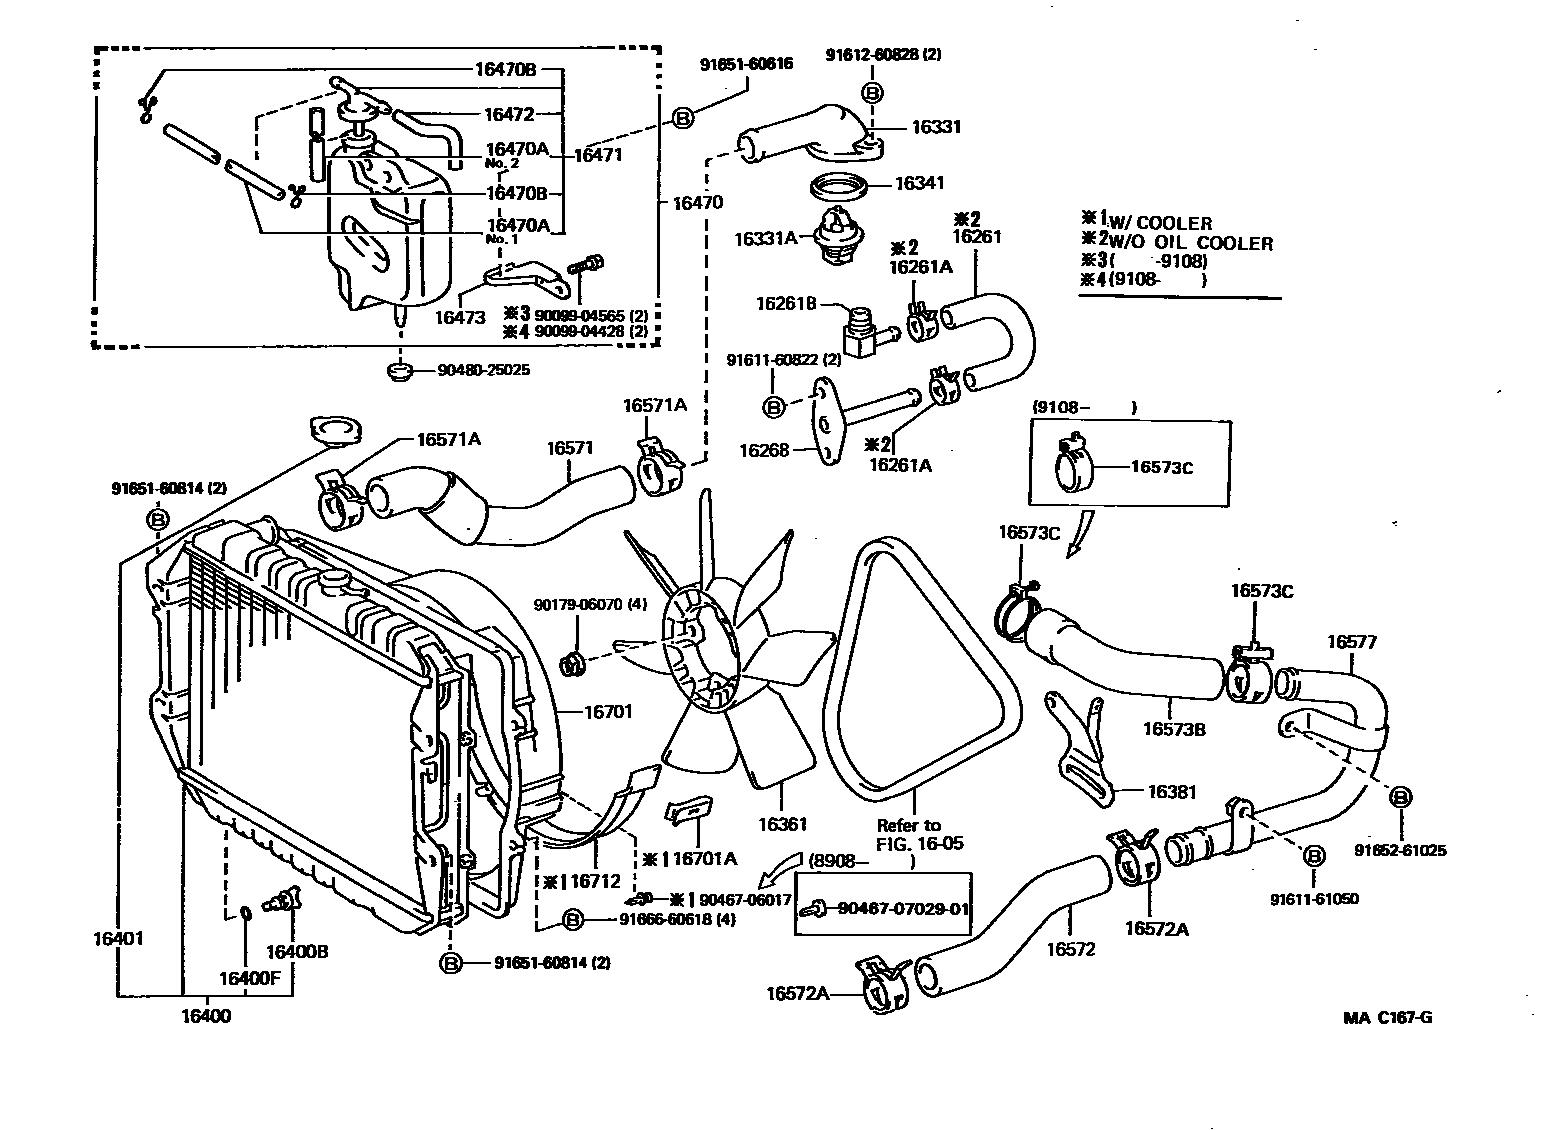 joe u0026 39 s 1987 4runner